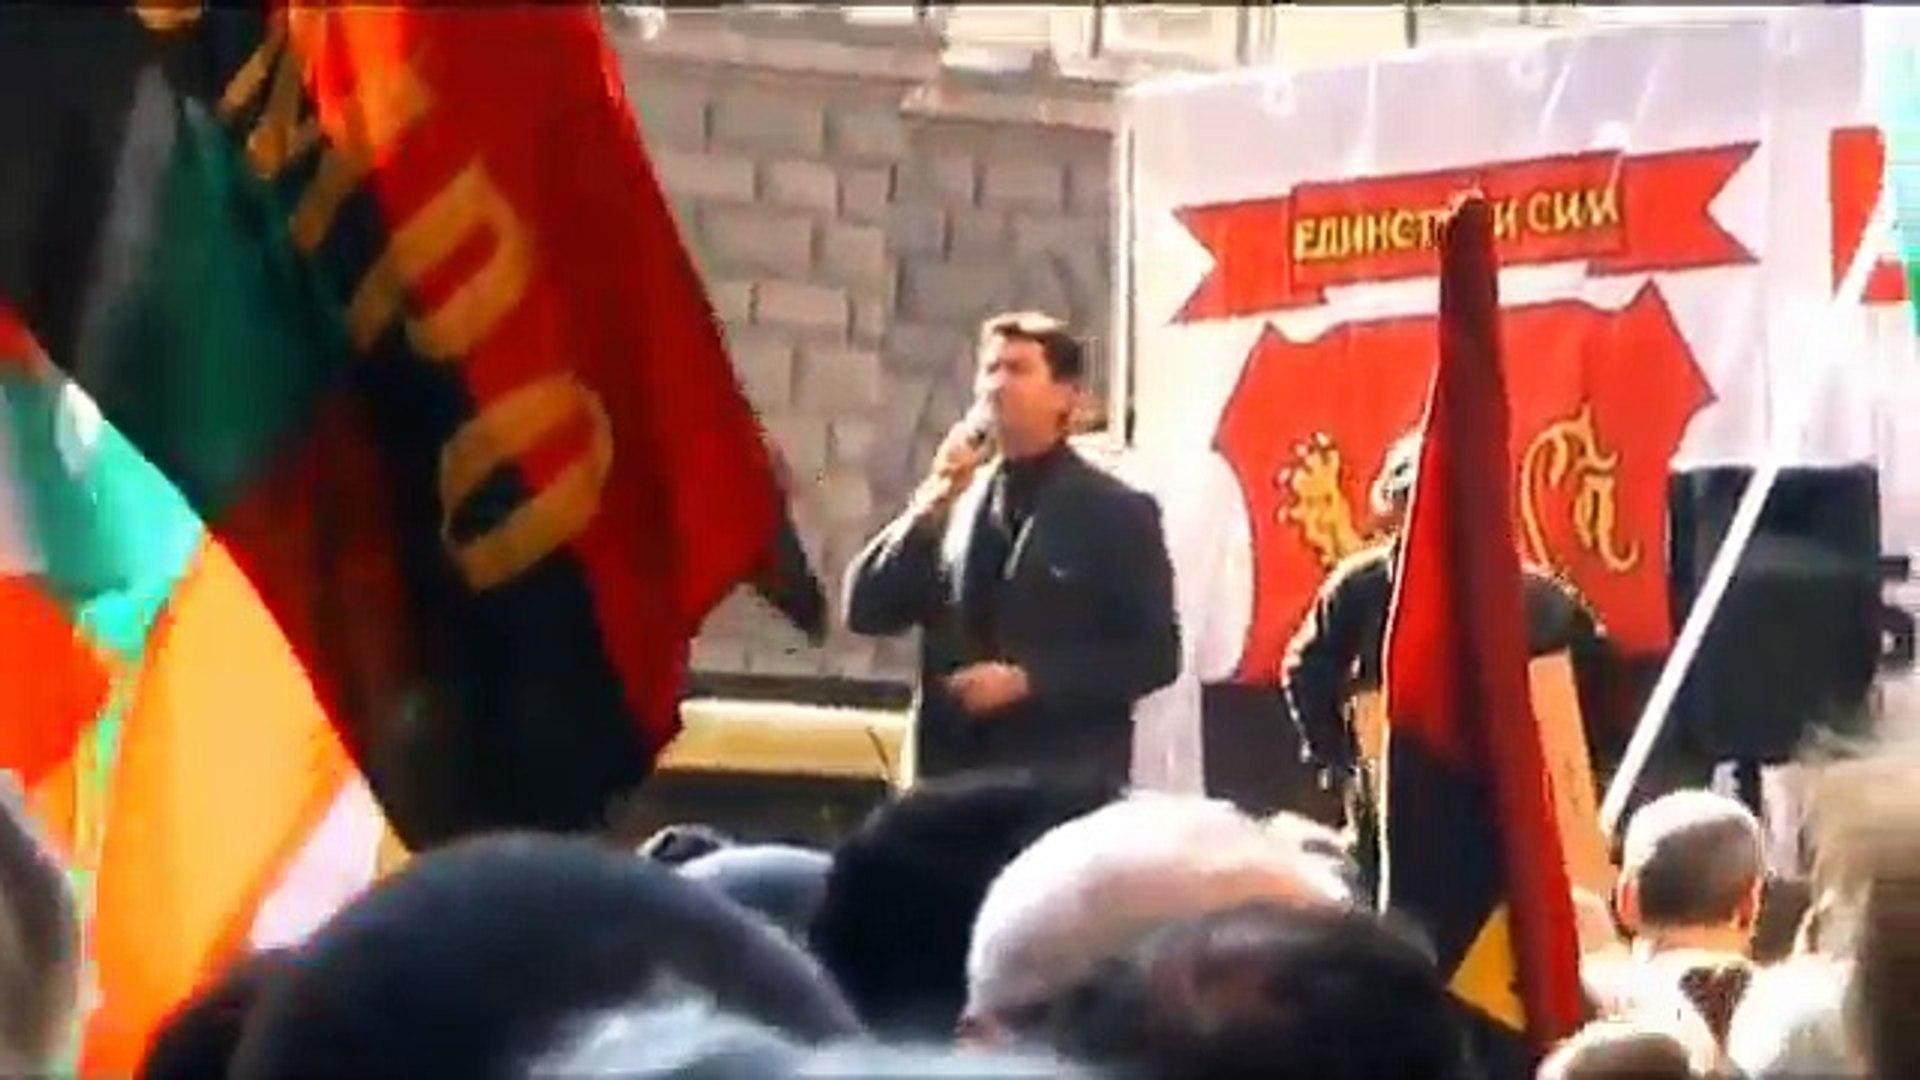 ВМРО - митинг 13.03.2011, София, България